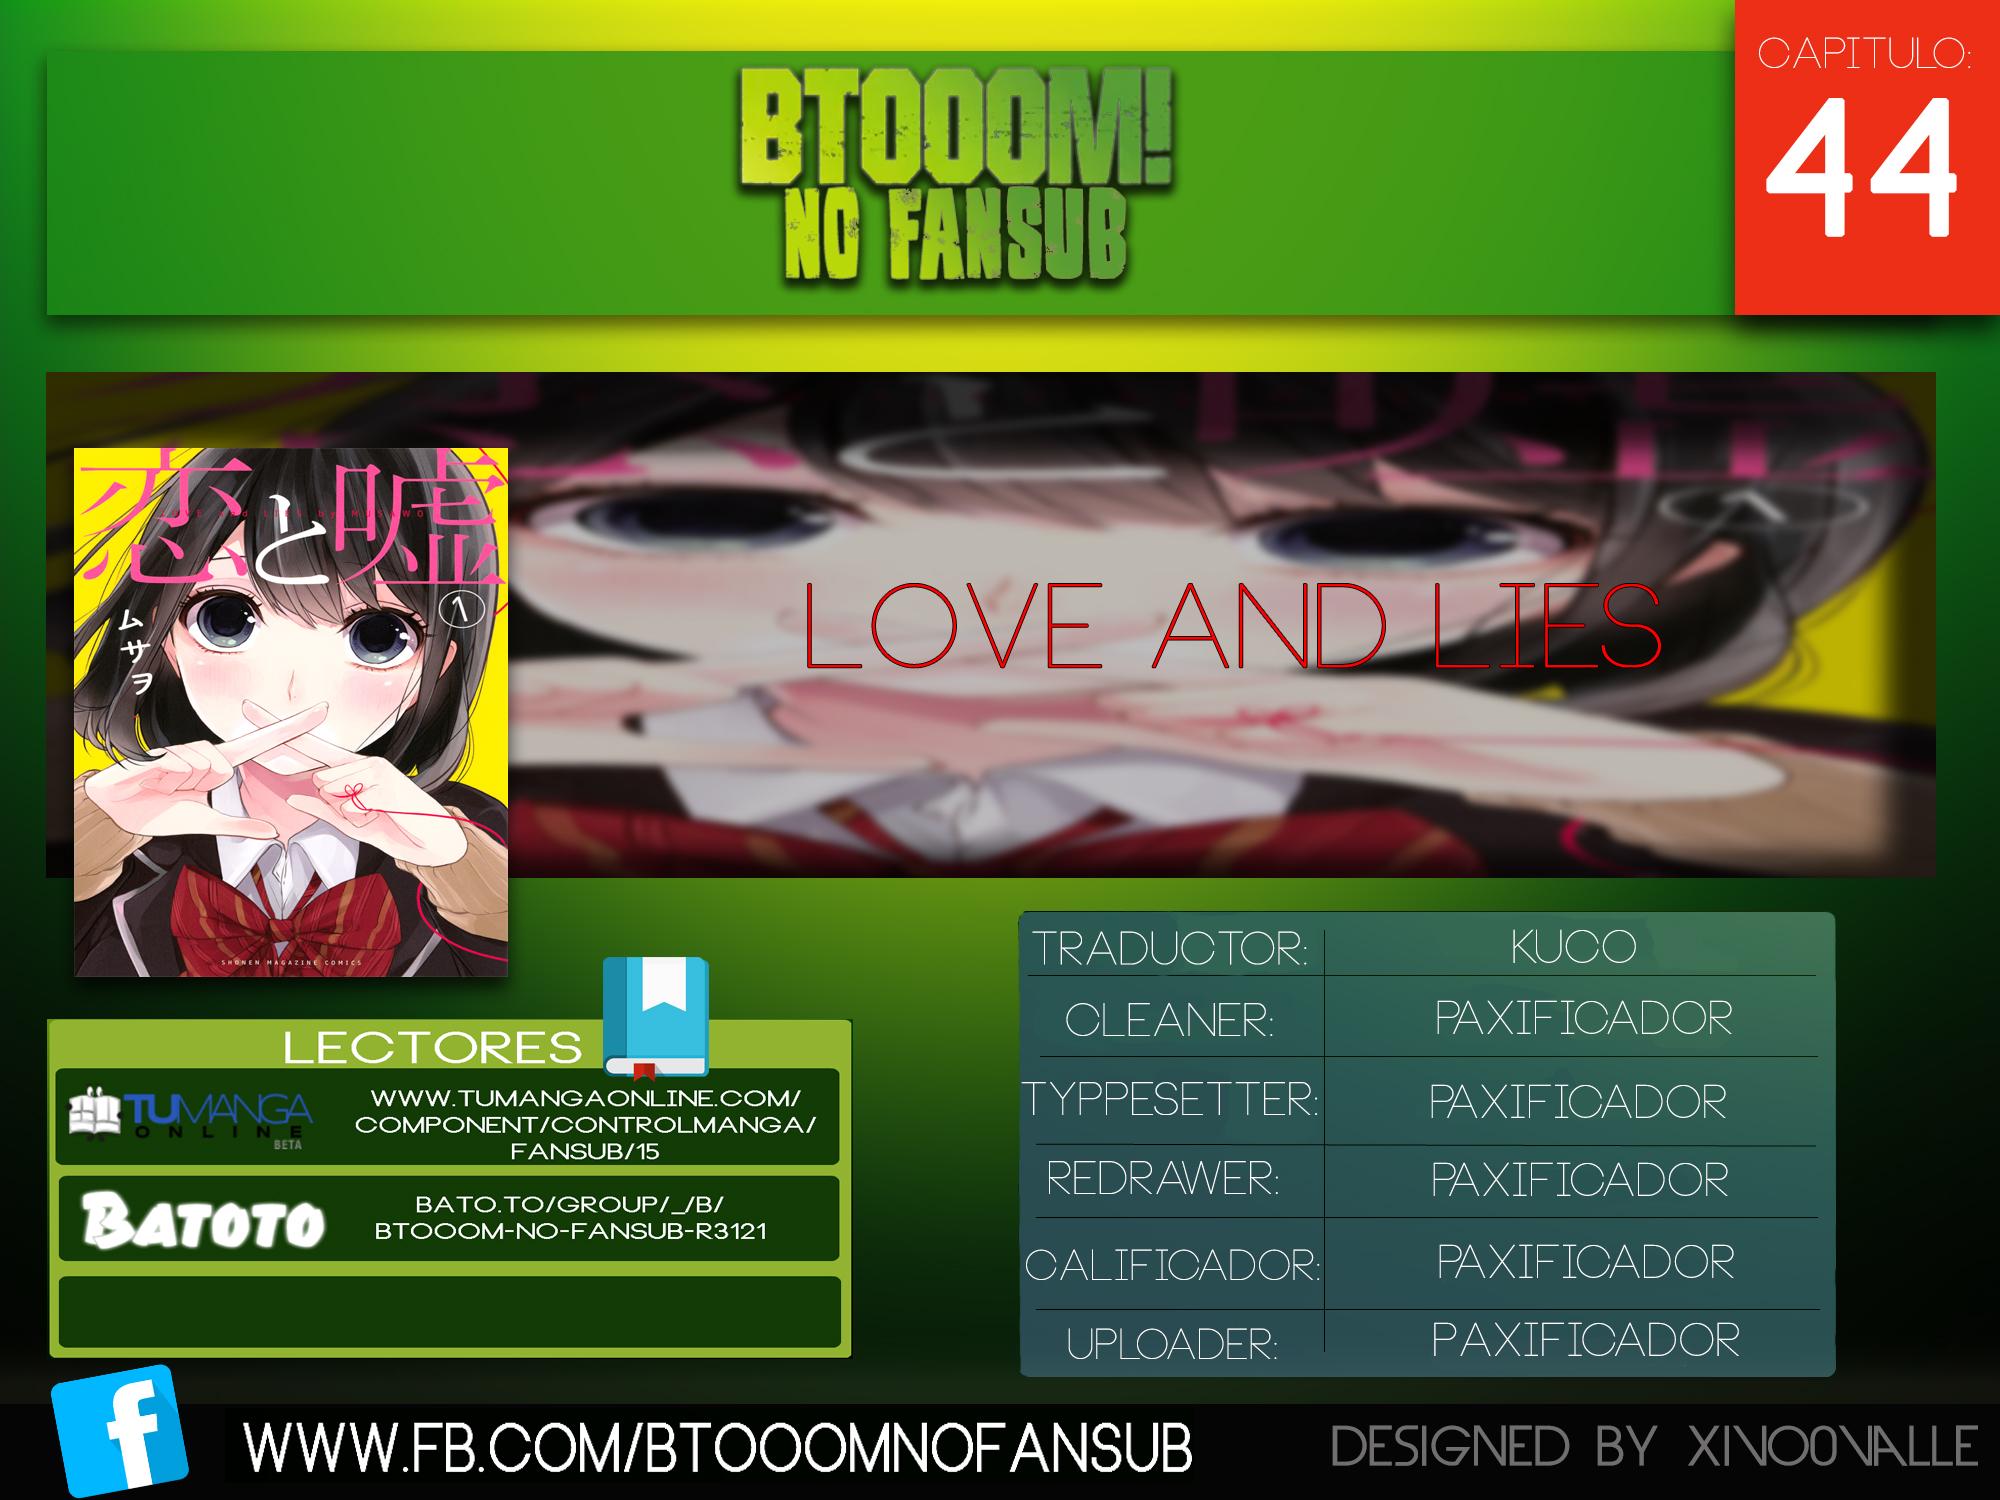 http://c5.ninemanga.com/es_manga/14/14734/392910/9bf4a3500a3d1198df75512492692cb2.jpg Page 1